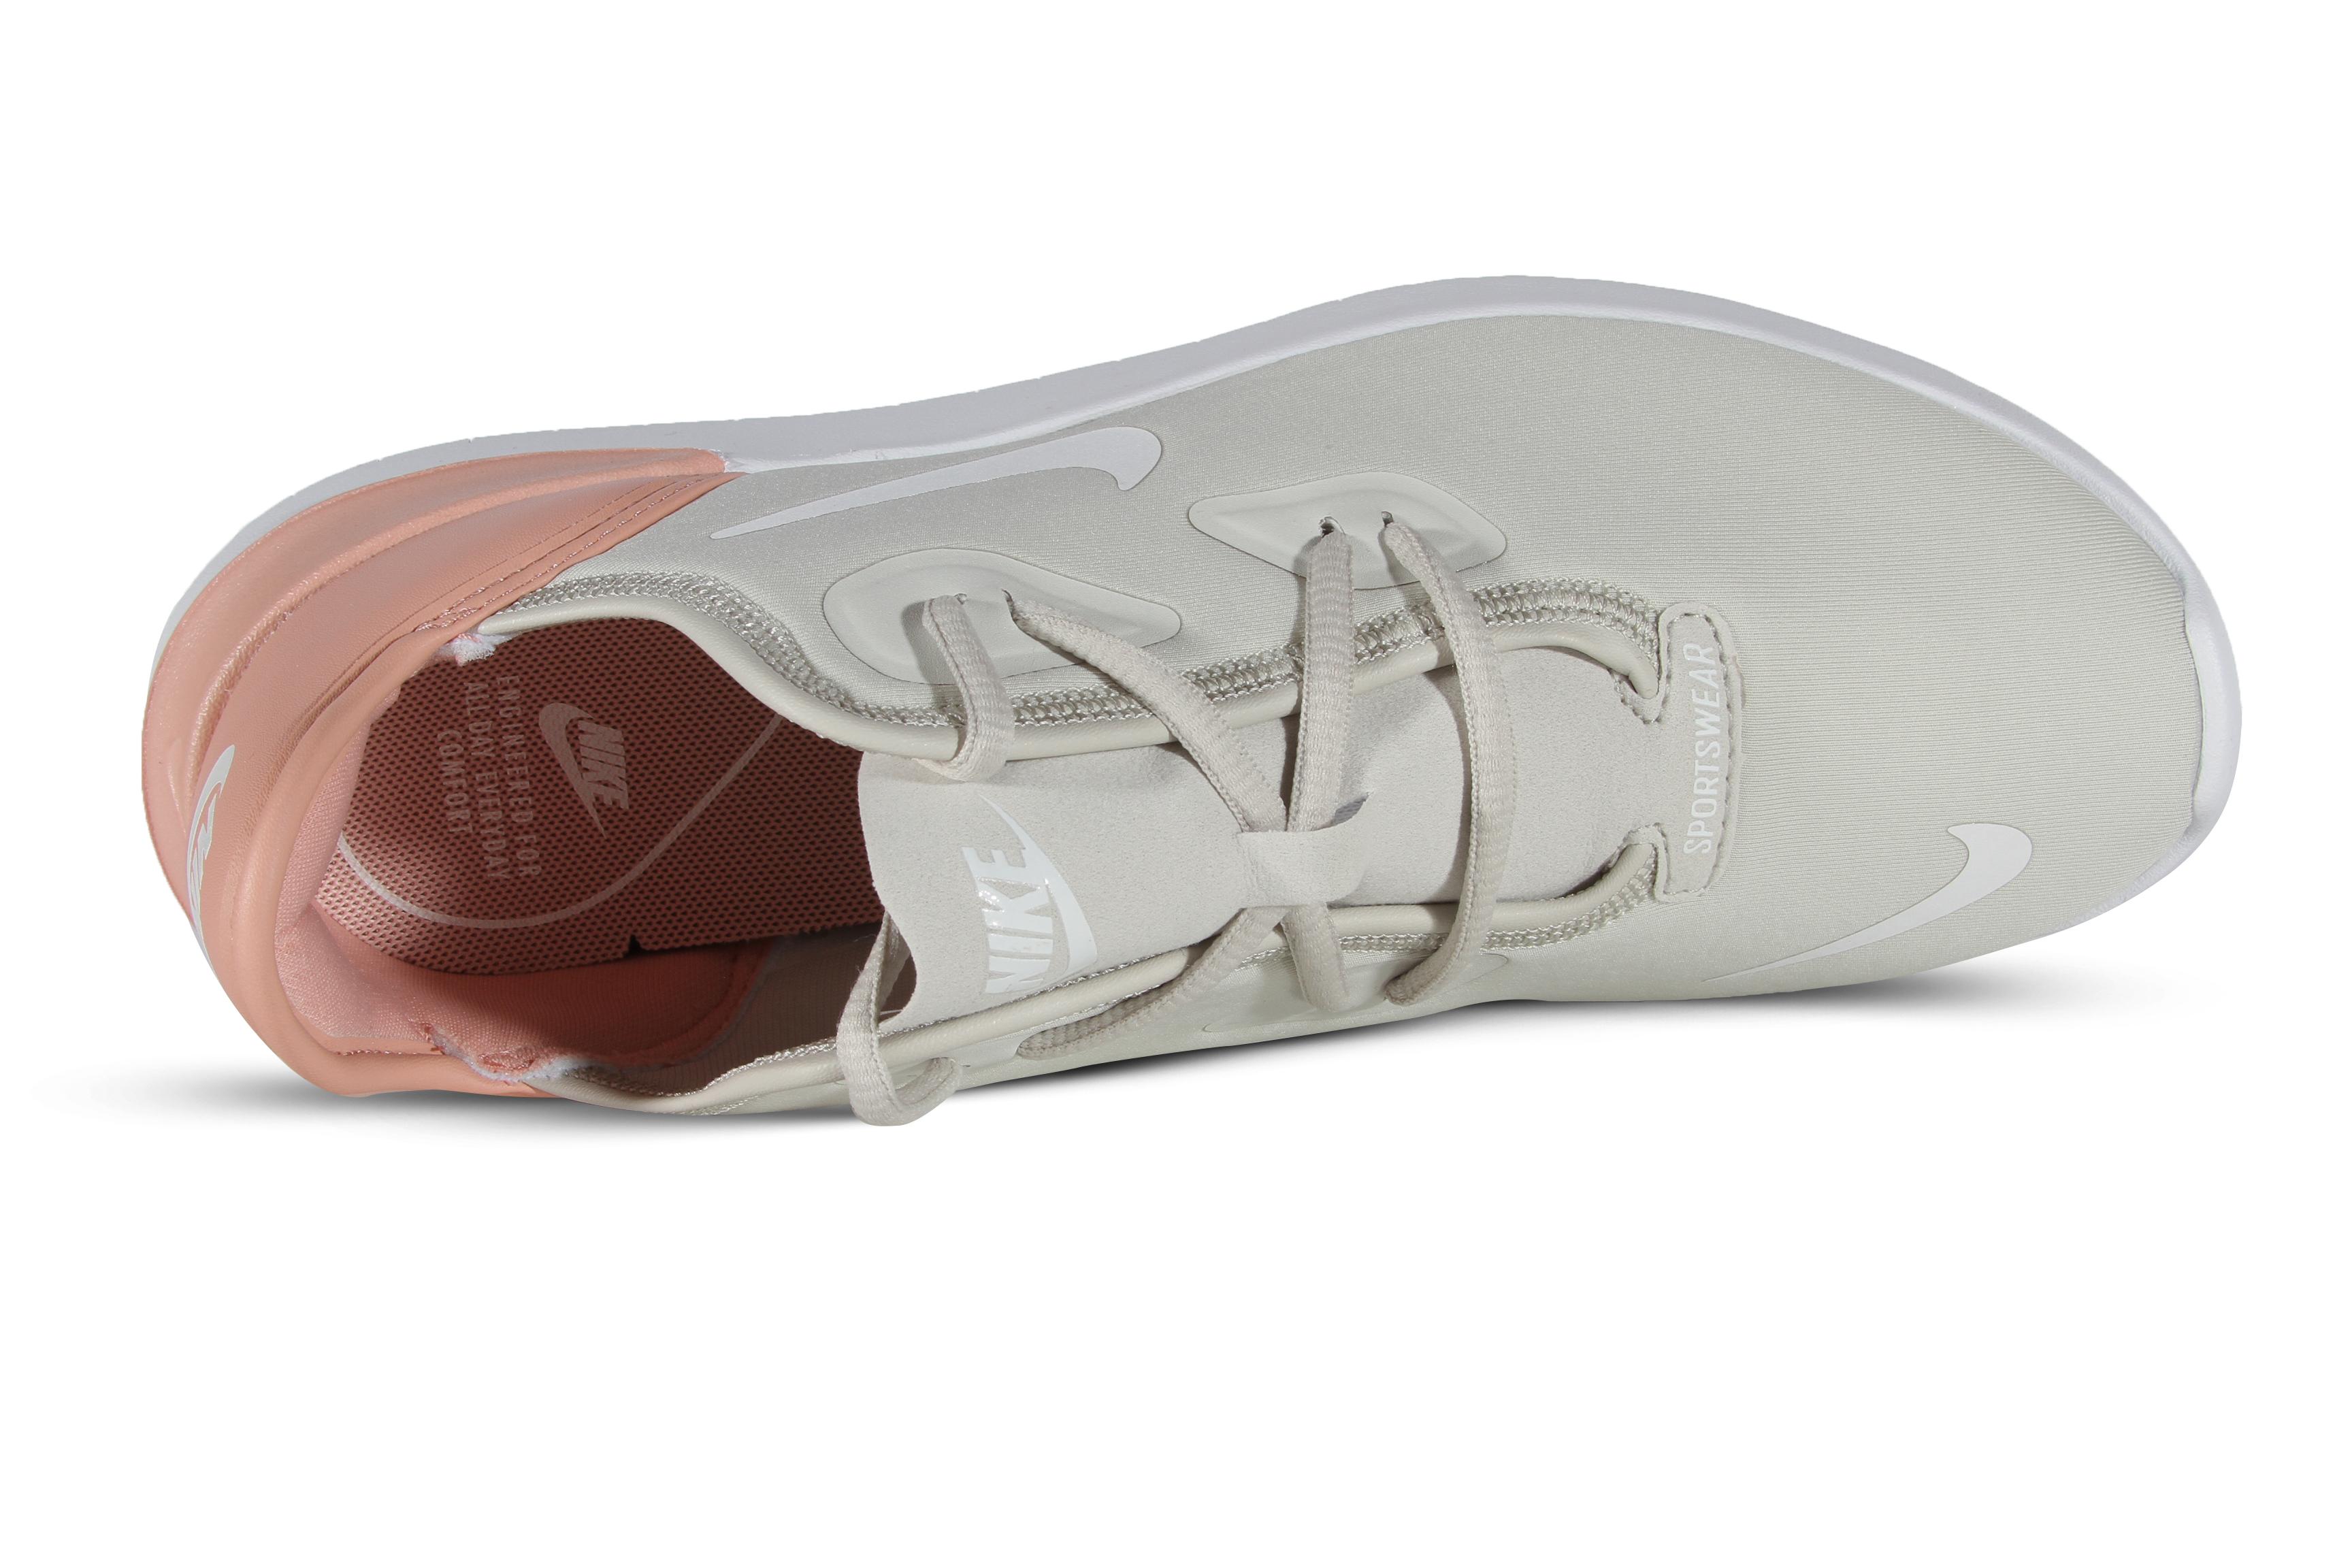 sale retailer f25cc 6e7e0 ... Nike Hakata Women s Running Shoes AJ8880-001 AJ8880-001 AJ8880-001  3fad4d ...